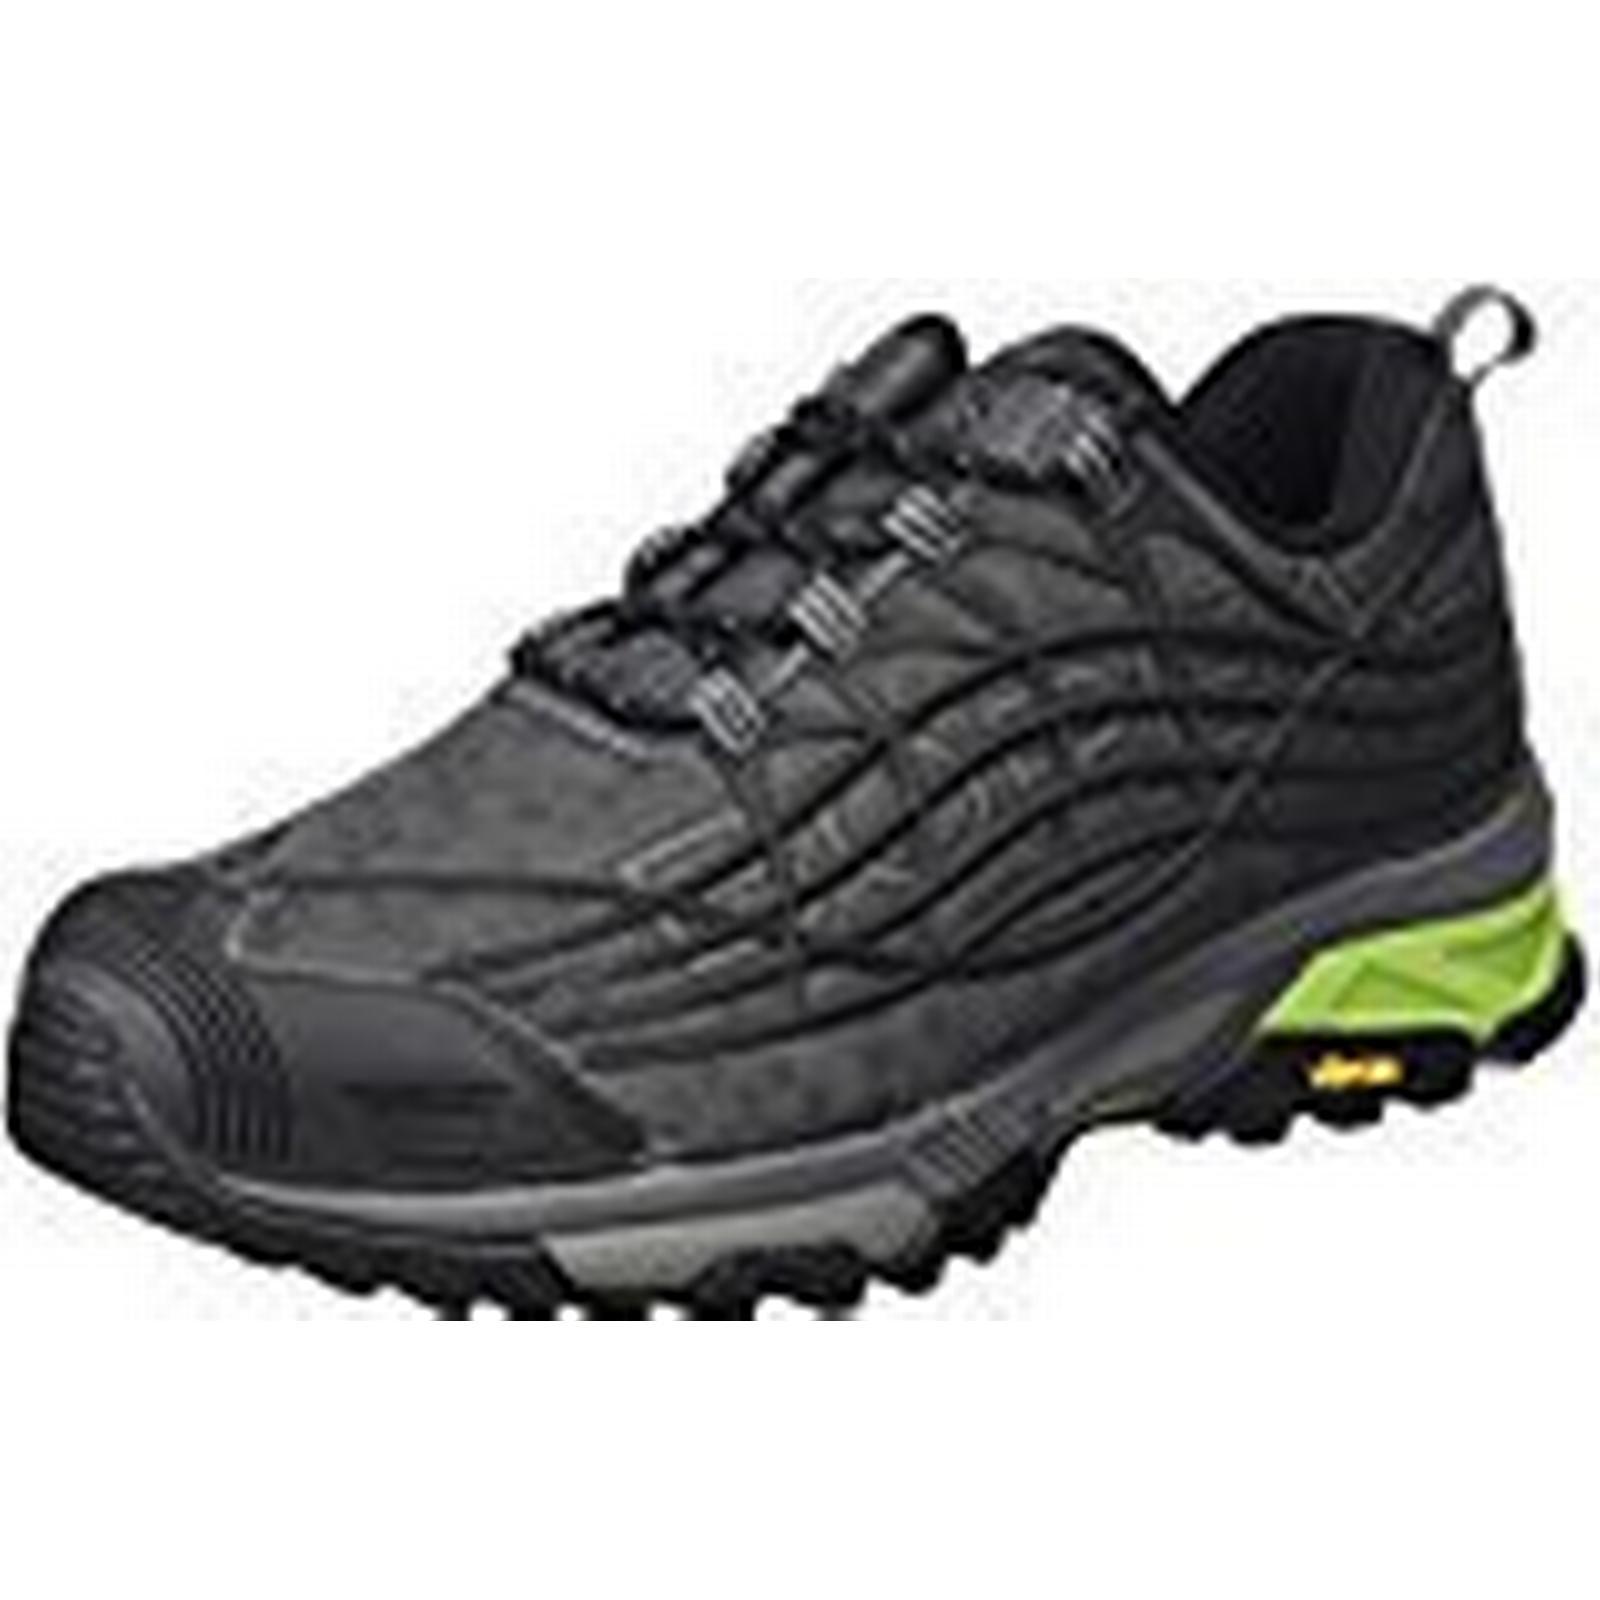 Boreal Futura Men, Men Sports Shoes, Men, Futura Futura, anthracite, 7 a99548